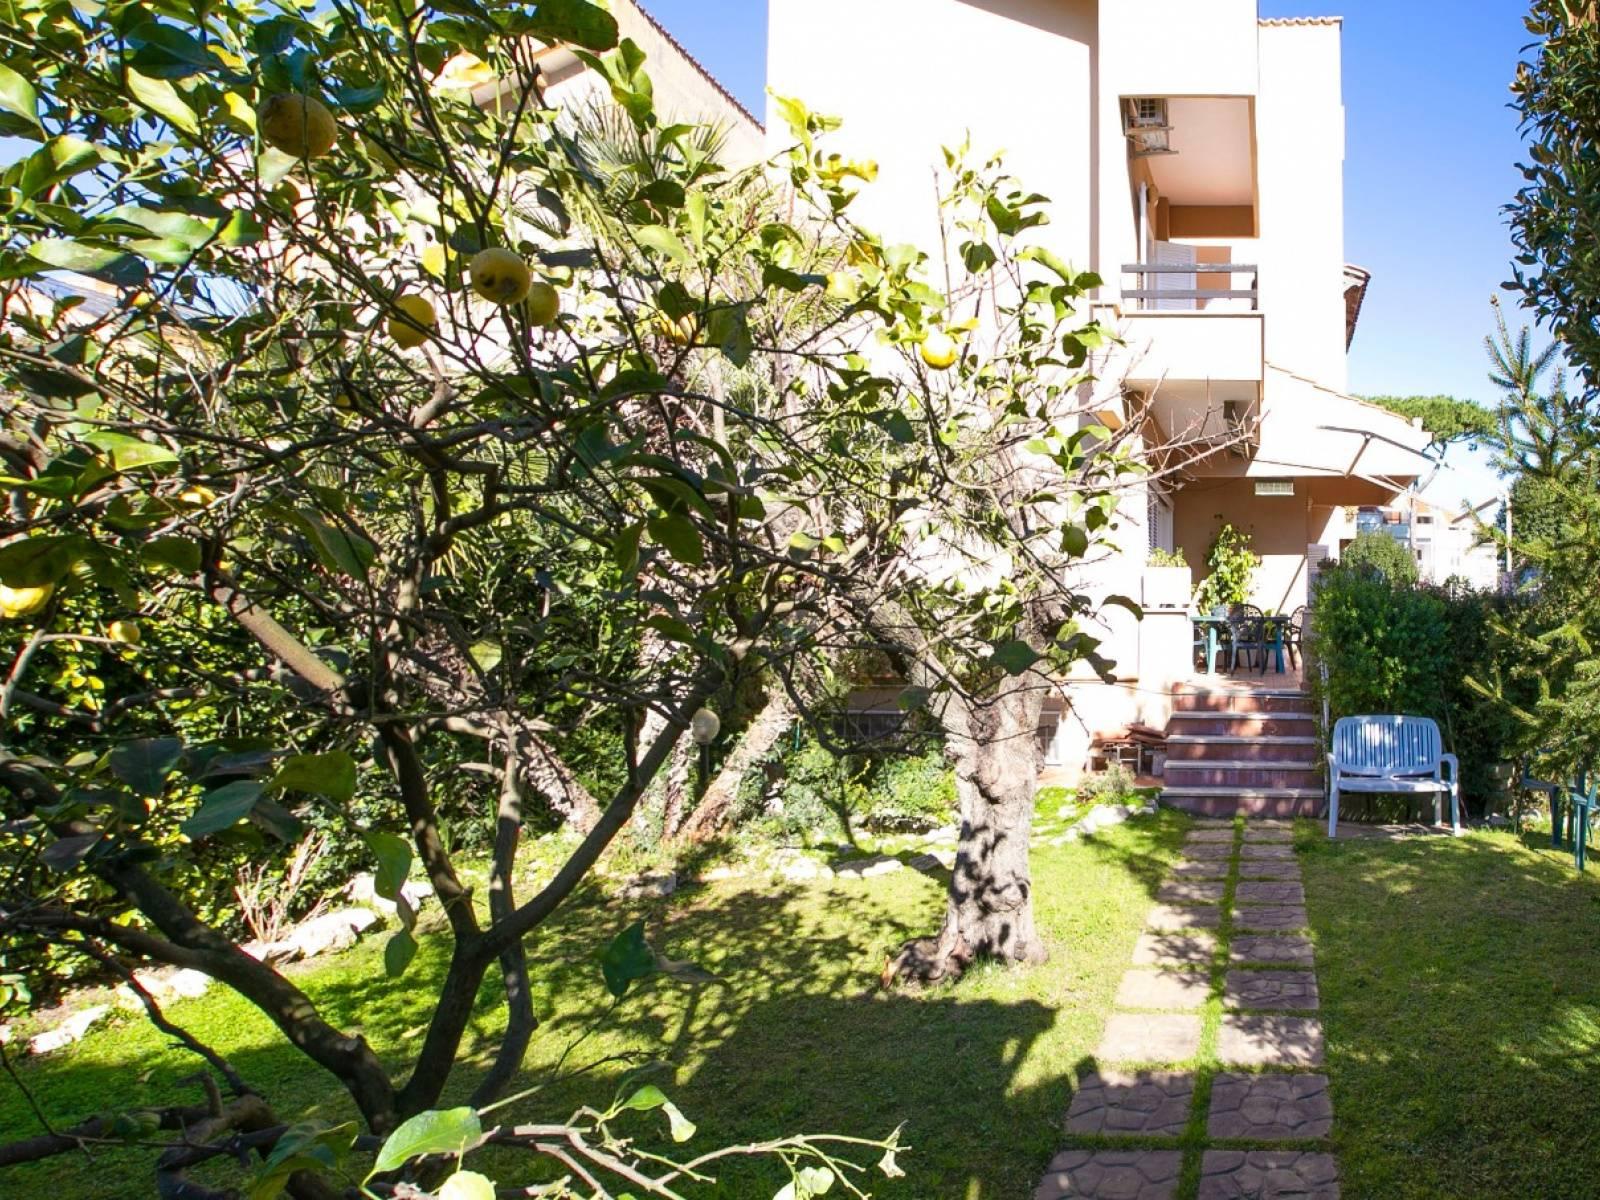 1118419358 Pentalocale in Via Ermesianatte, Roma, Zona Axa